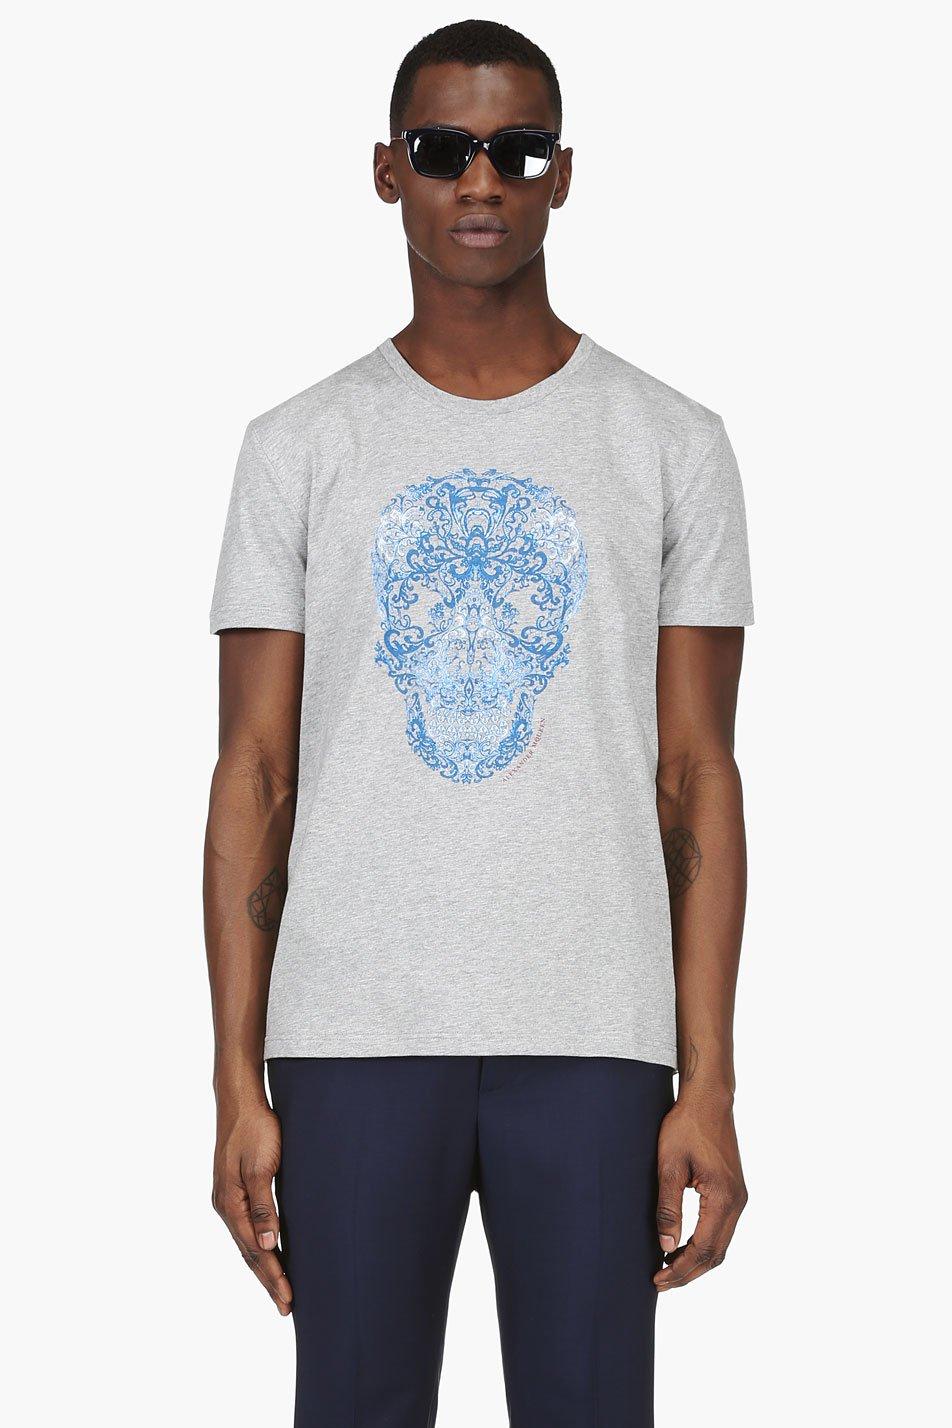 alexander mcqueen heathered grey floral skull t_shirt